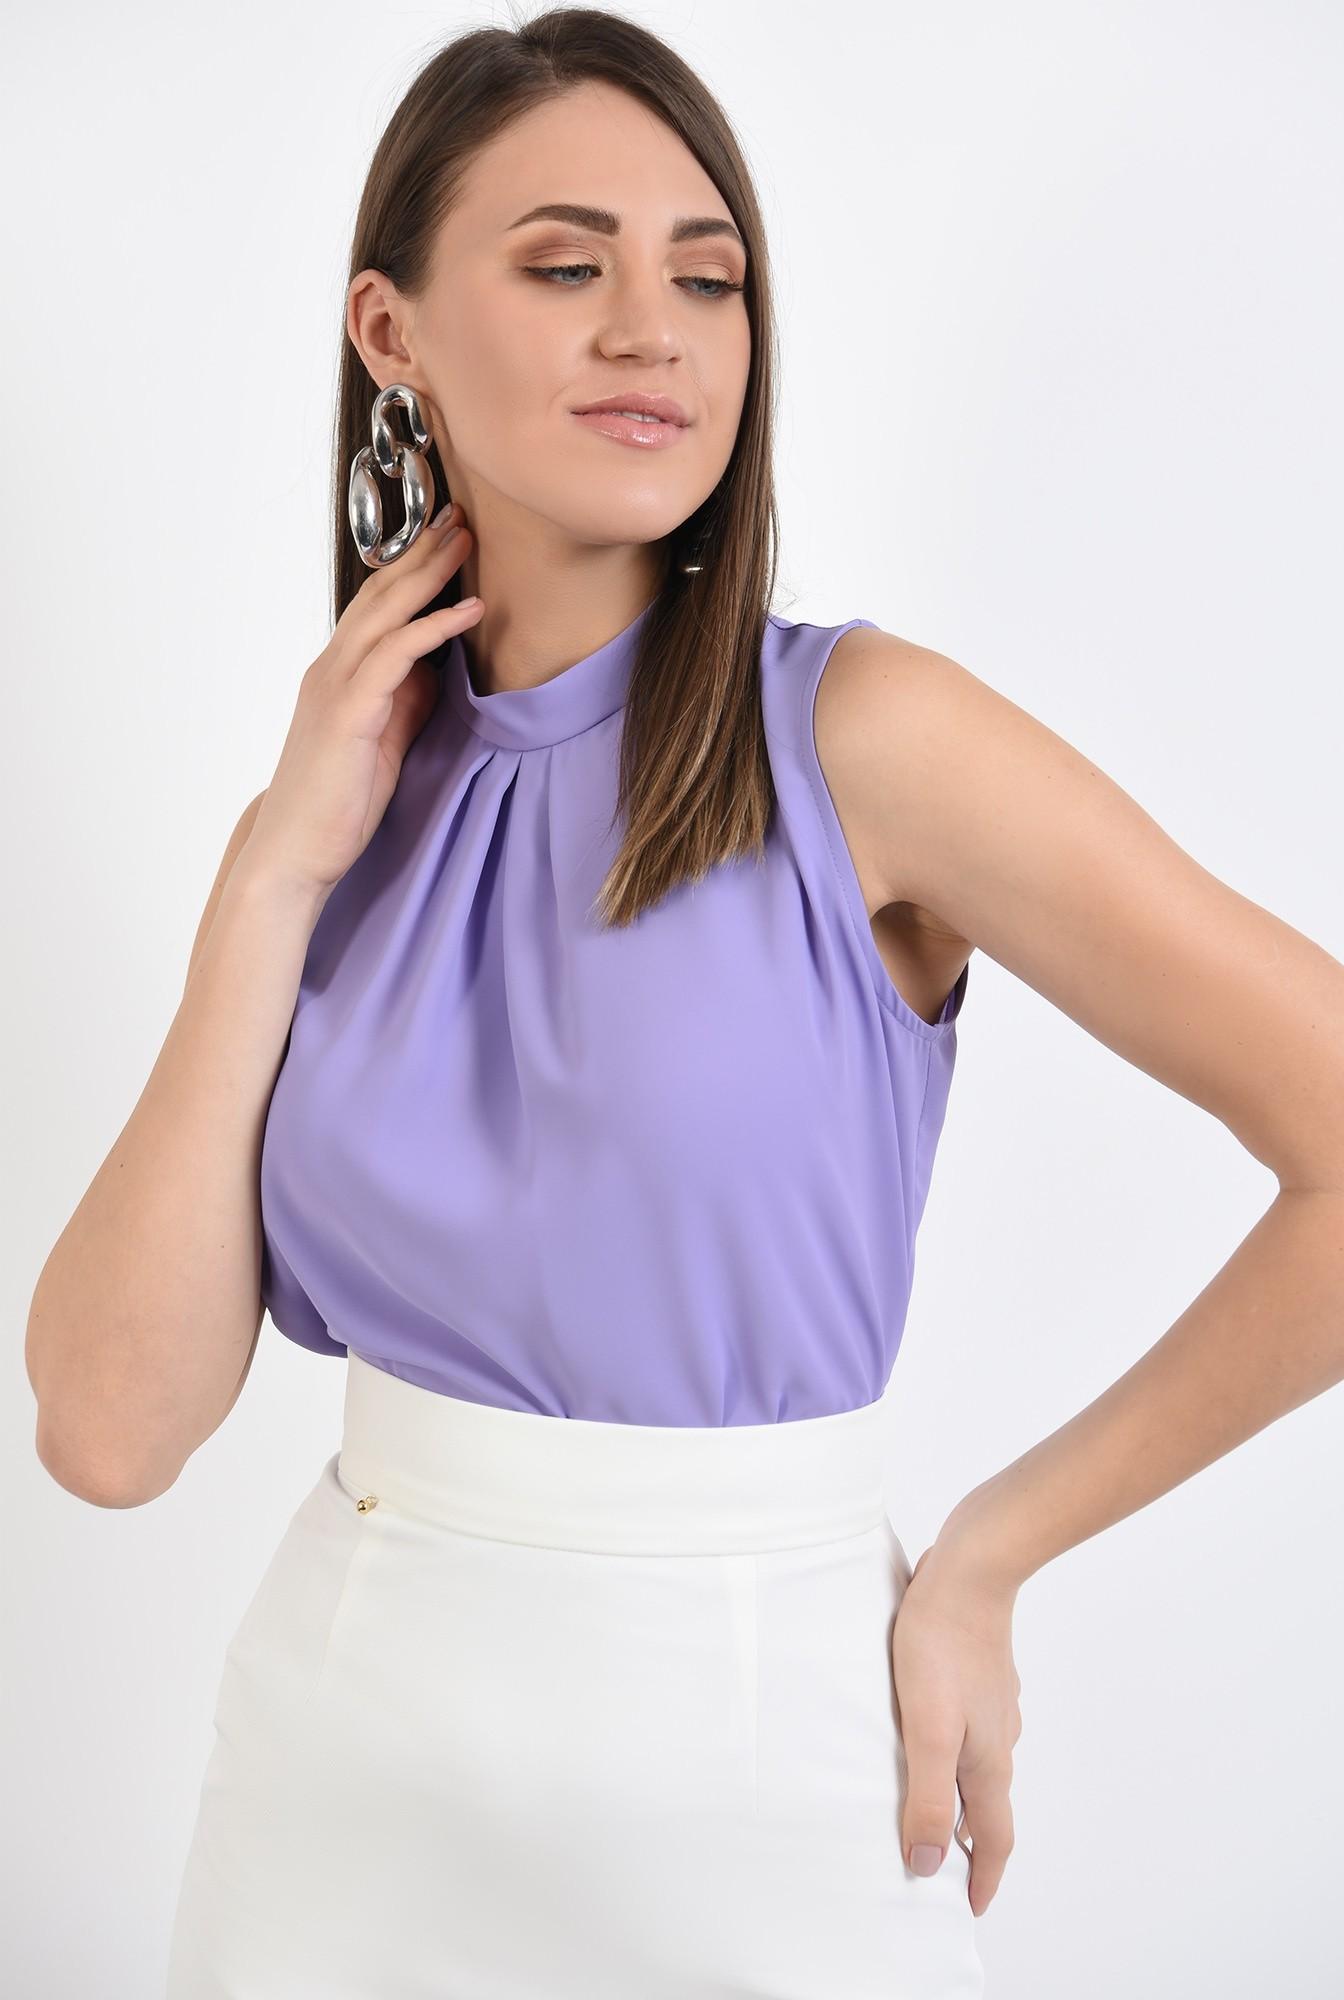 bluza office, pliuri, guler mic, lila, bluza de primavara